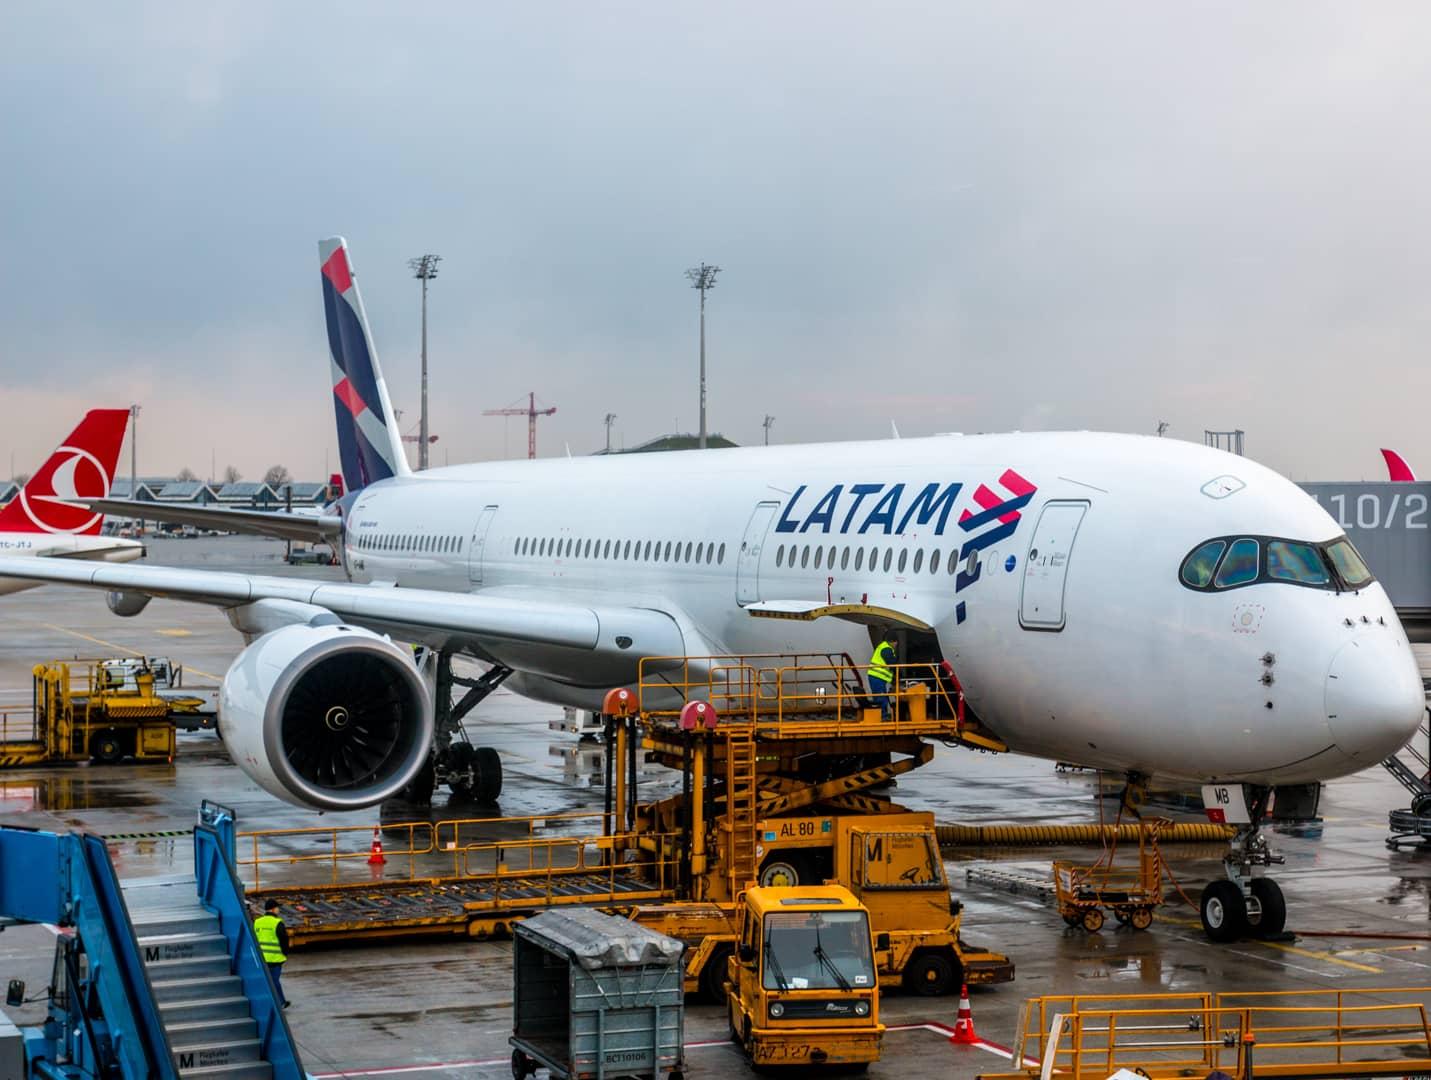 LATAM Airlines A350-900 XWB